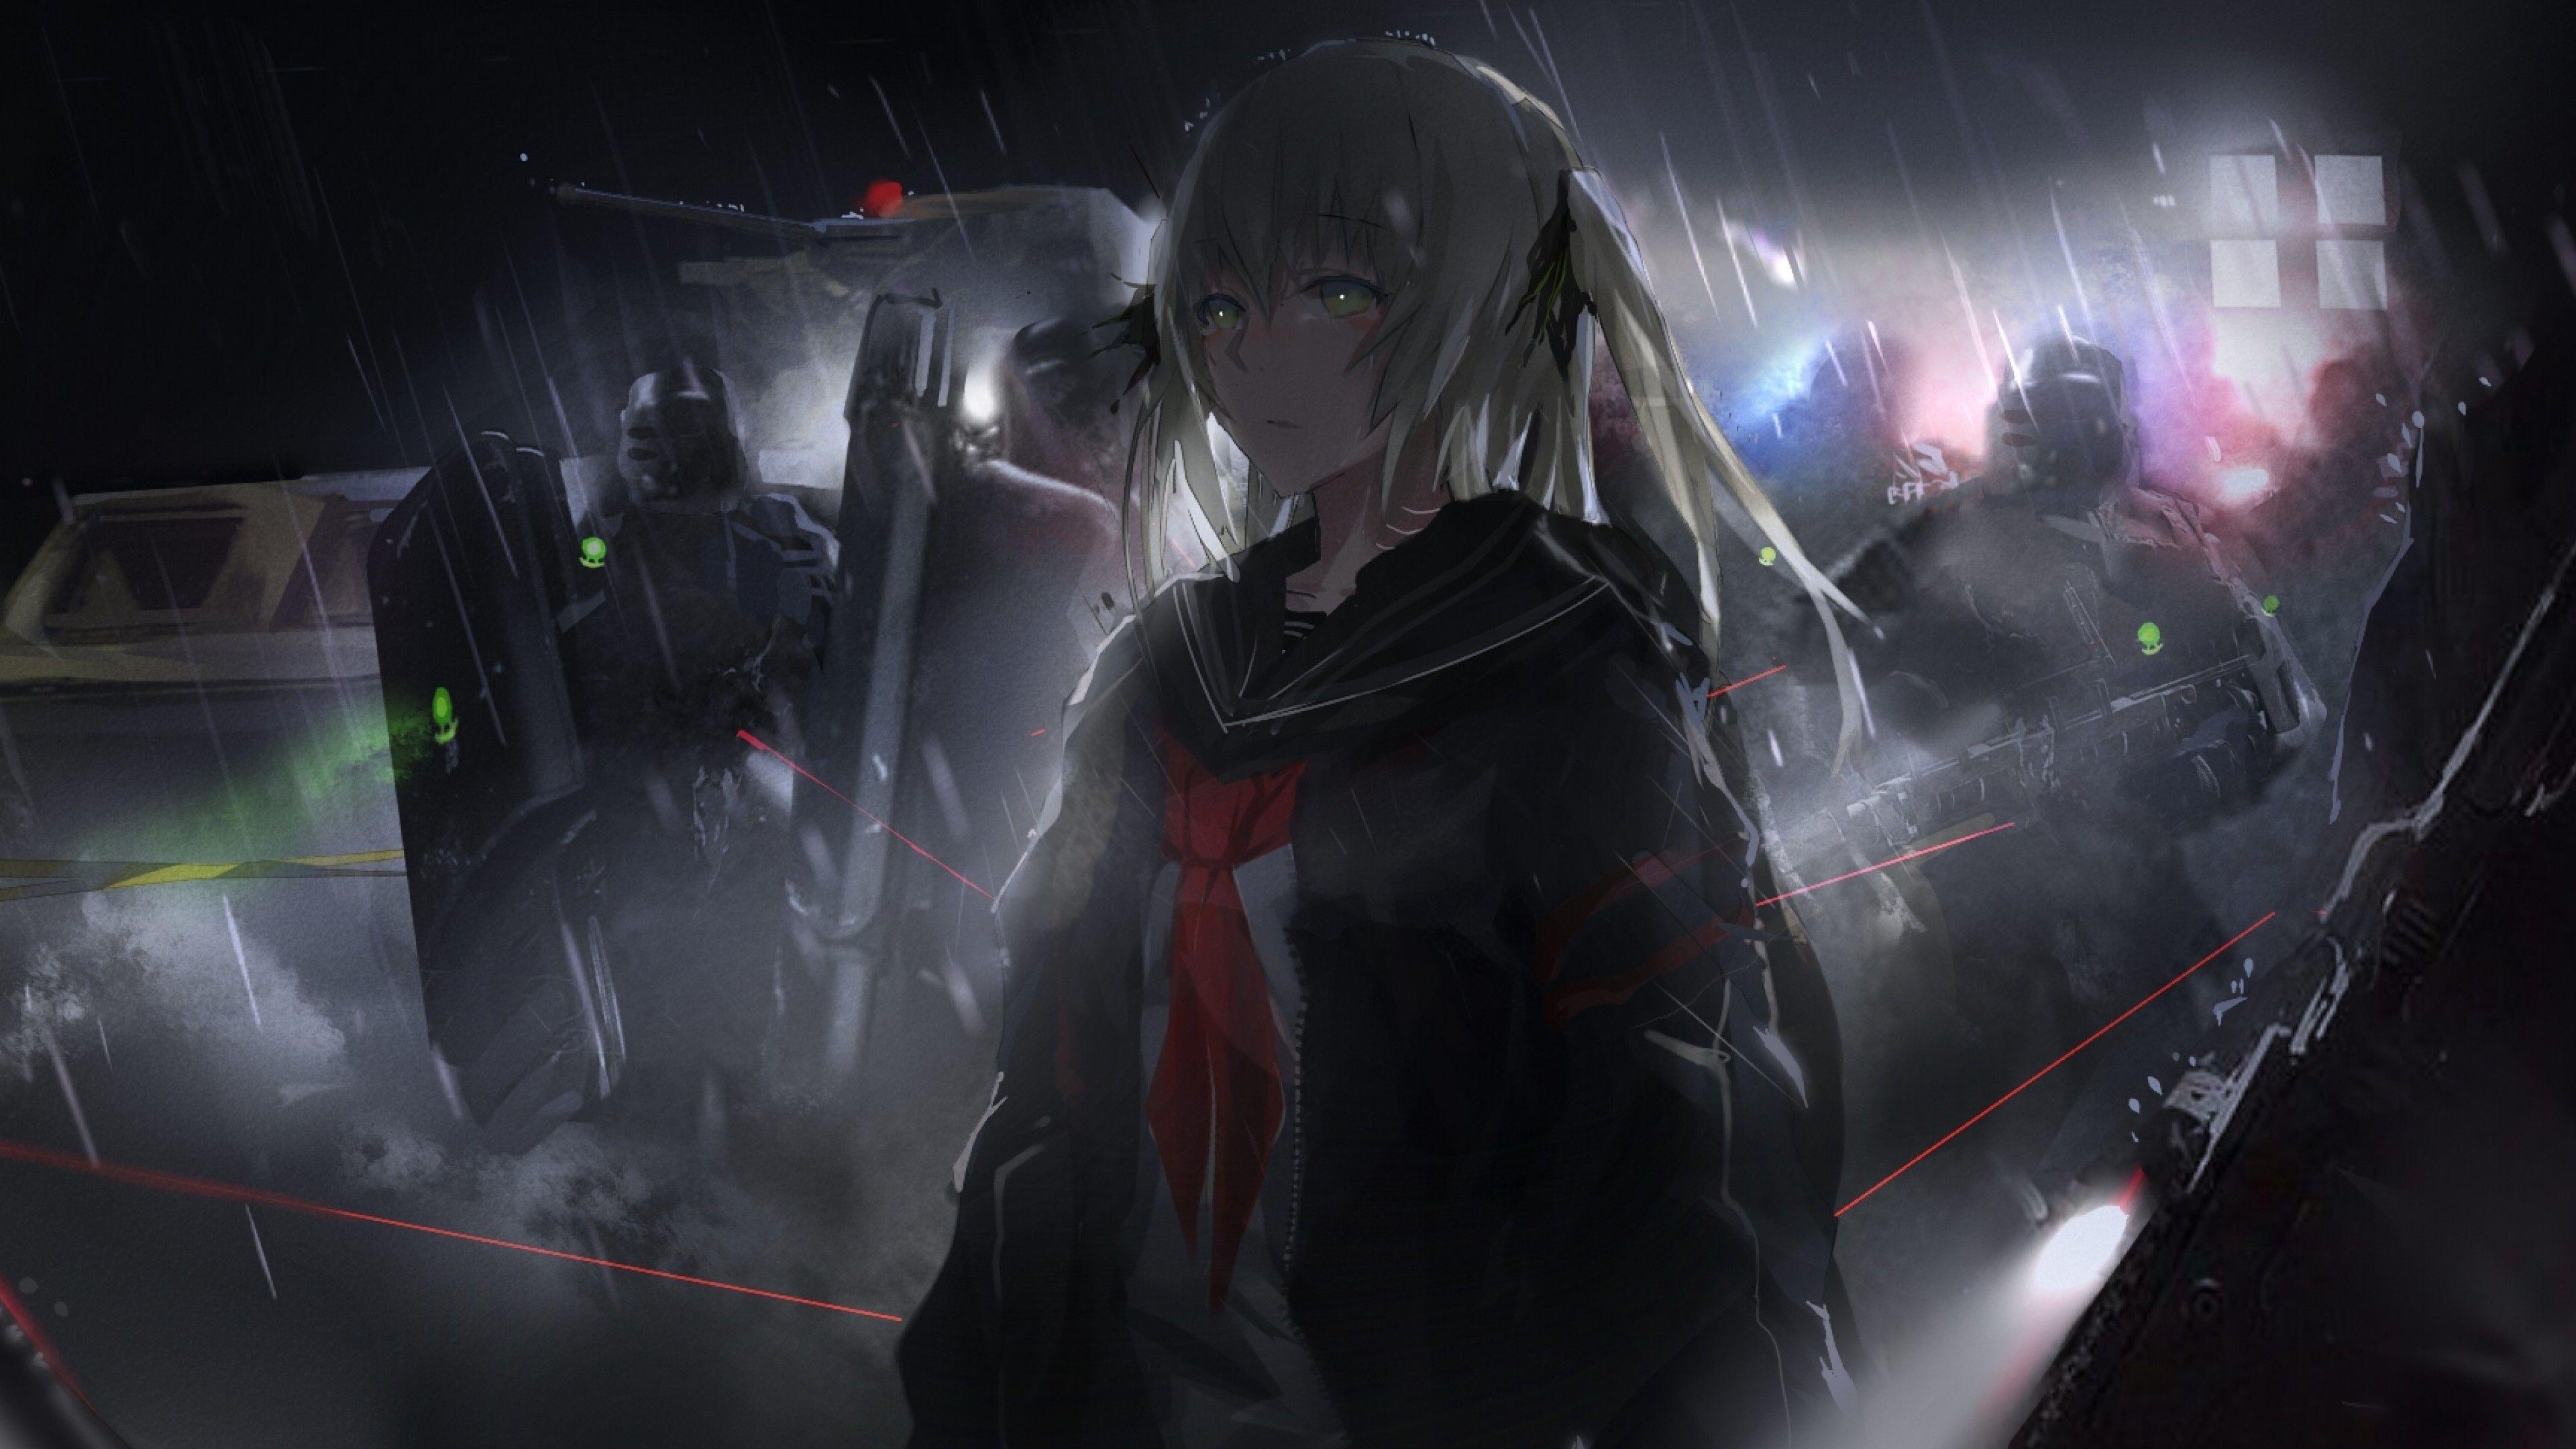 Anime Dark Theme Wallpapers - Wallpaper Cave